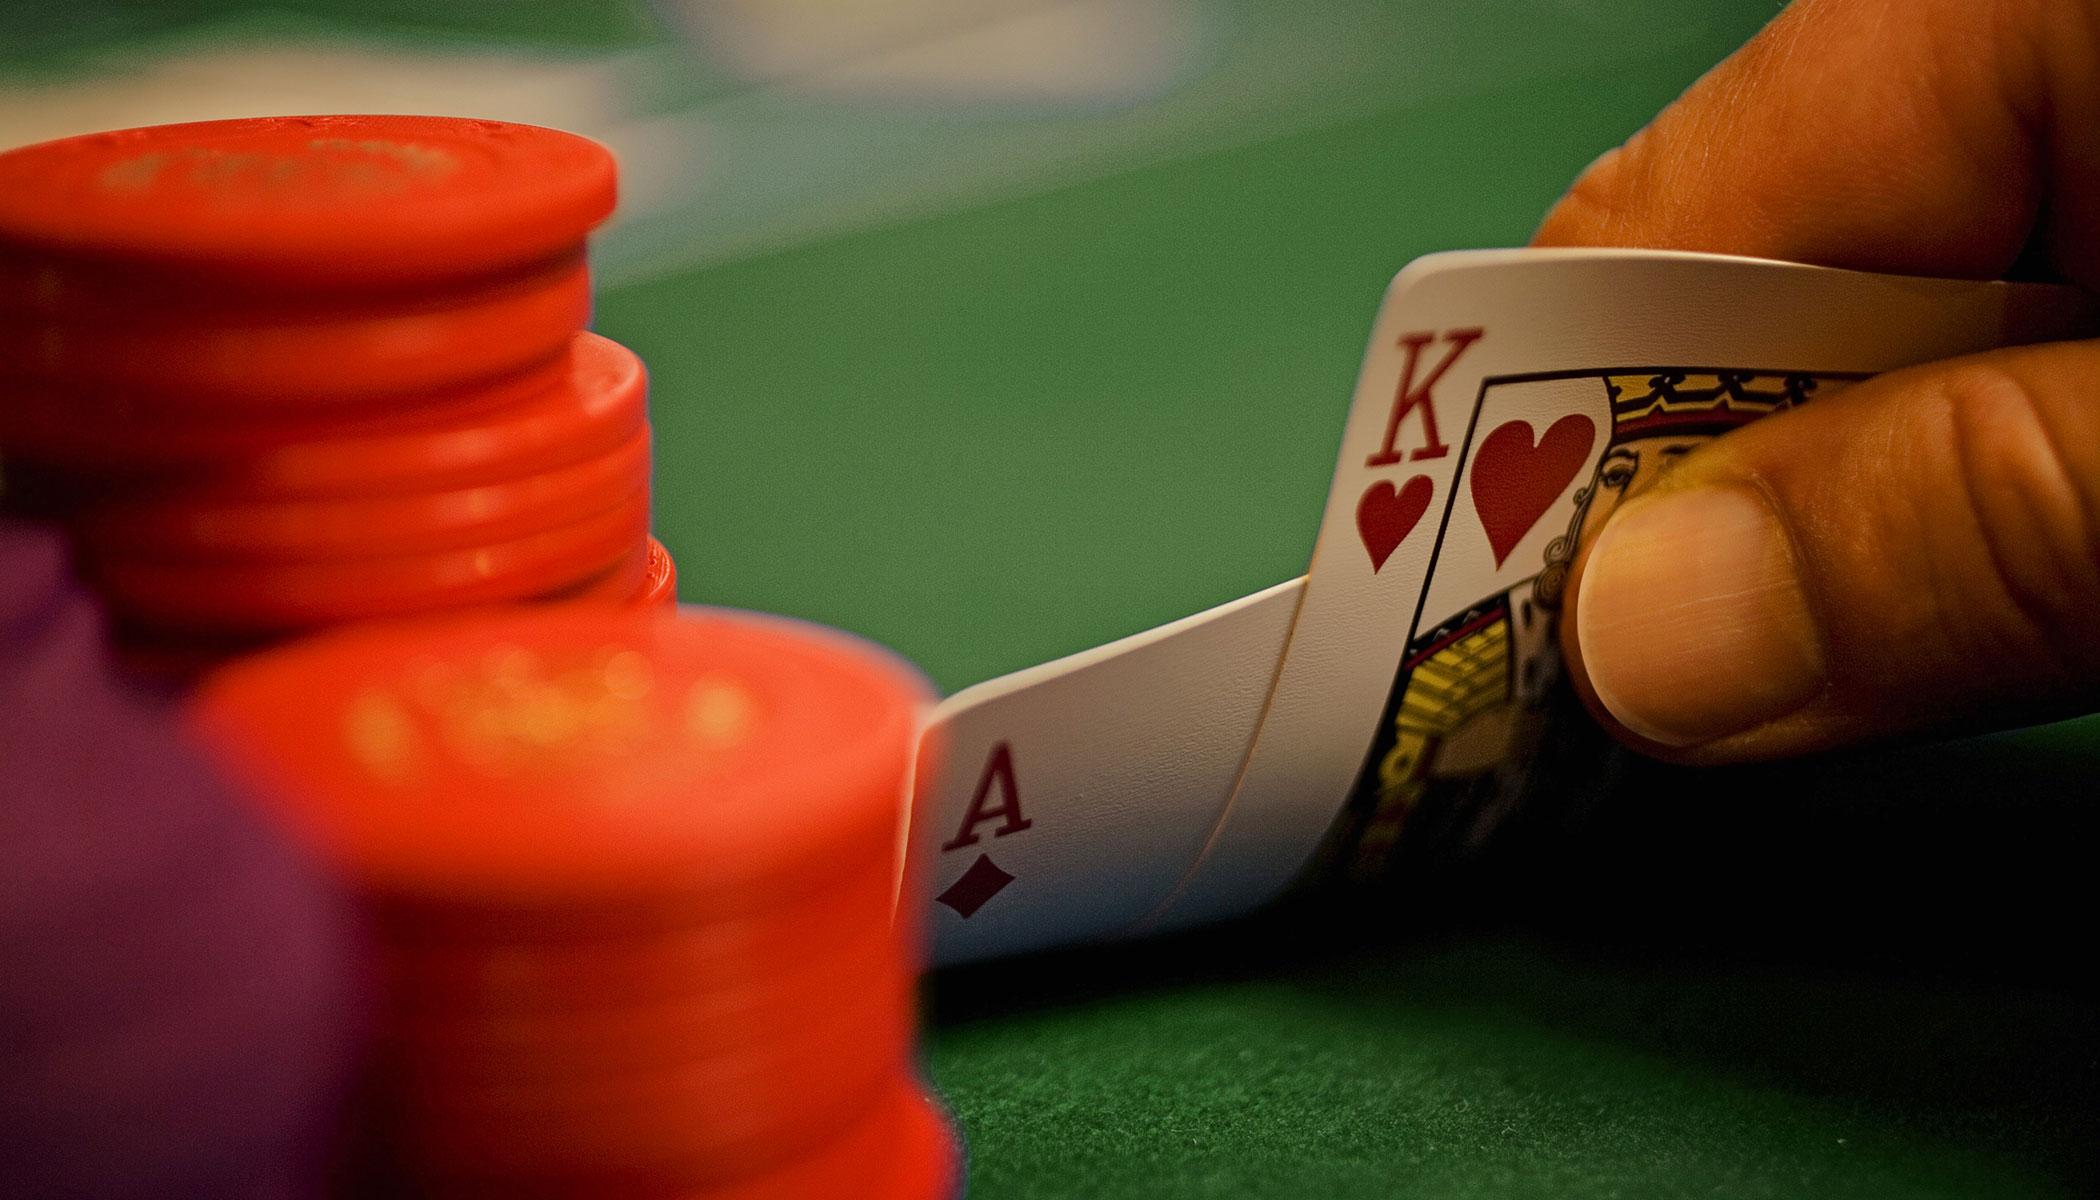 Blackjack table wallpaper - Blackjack